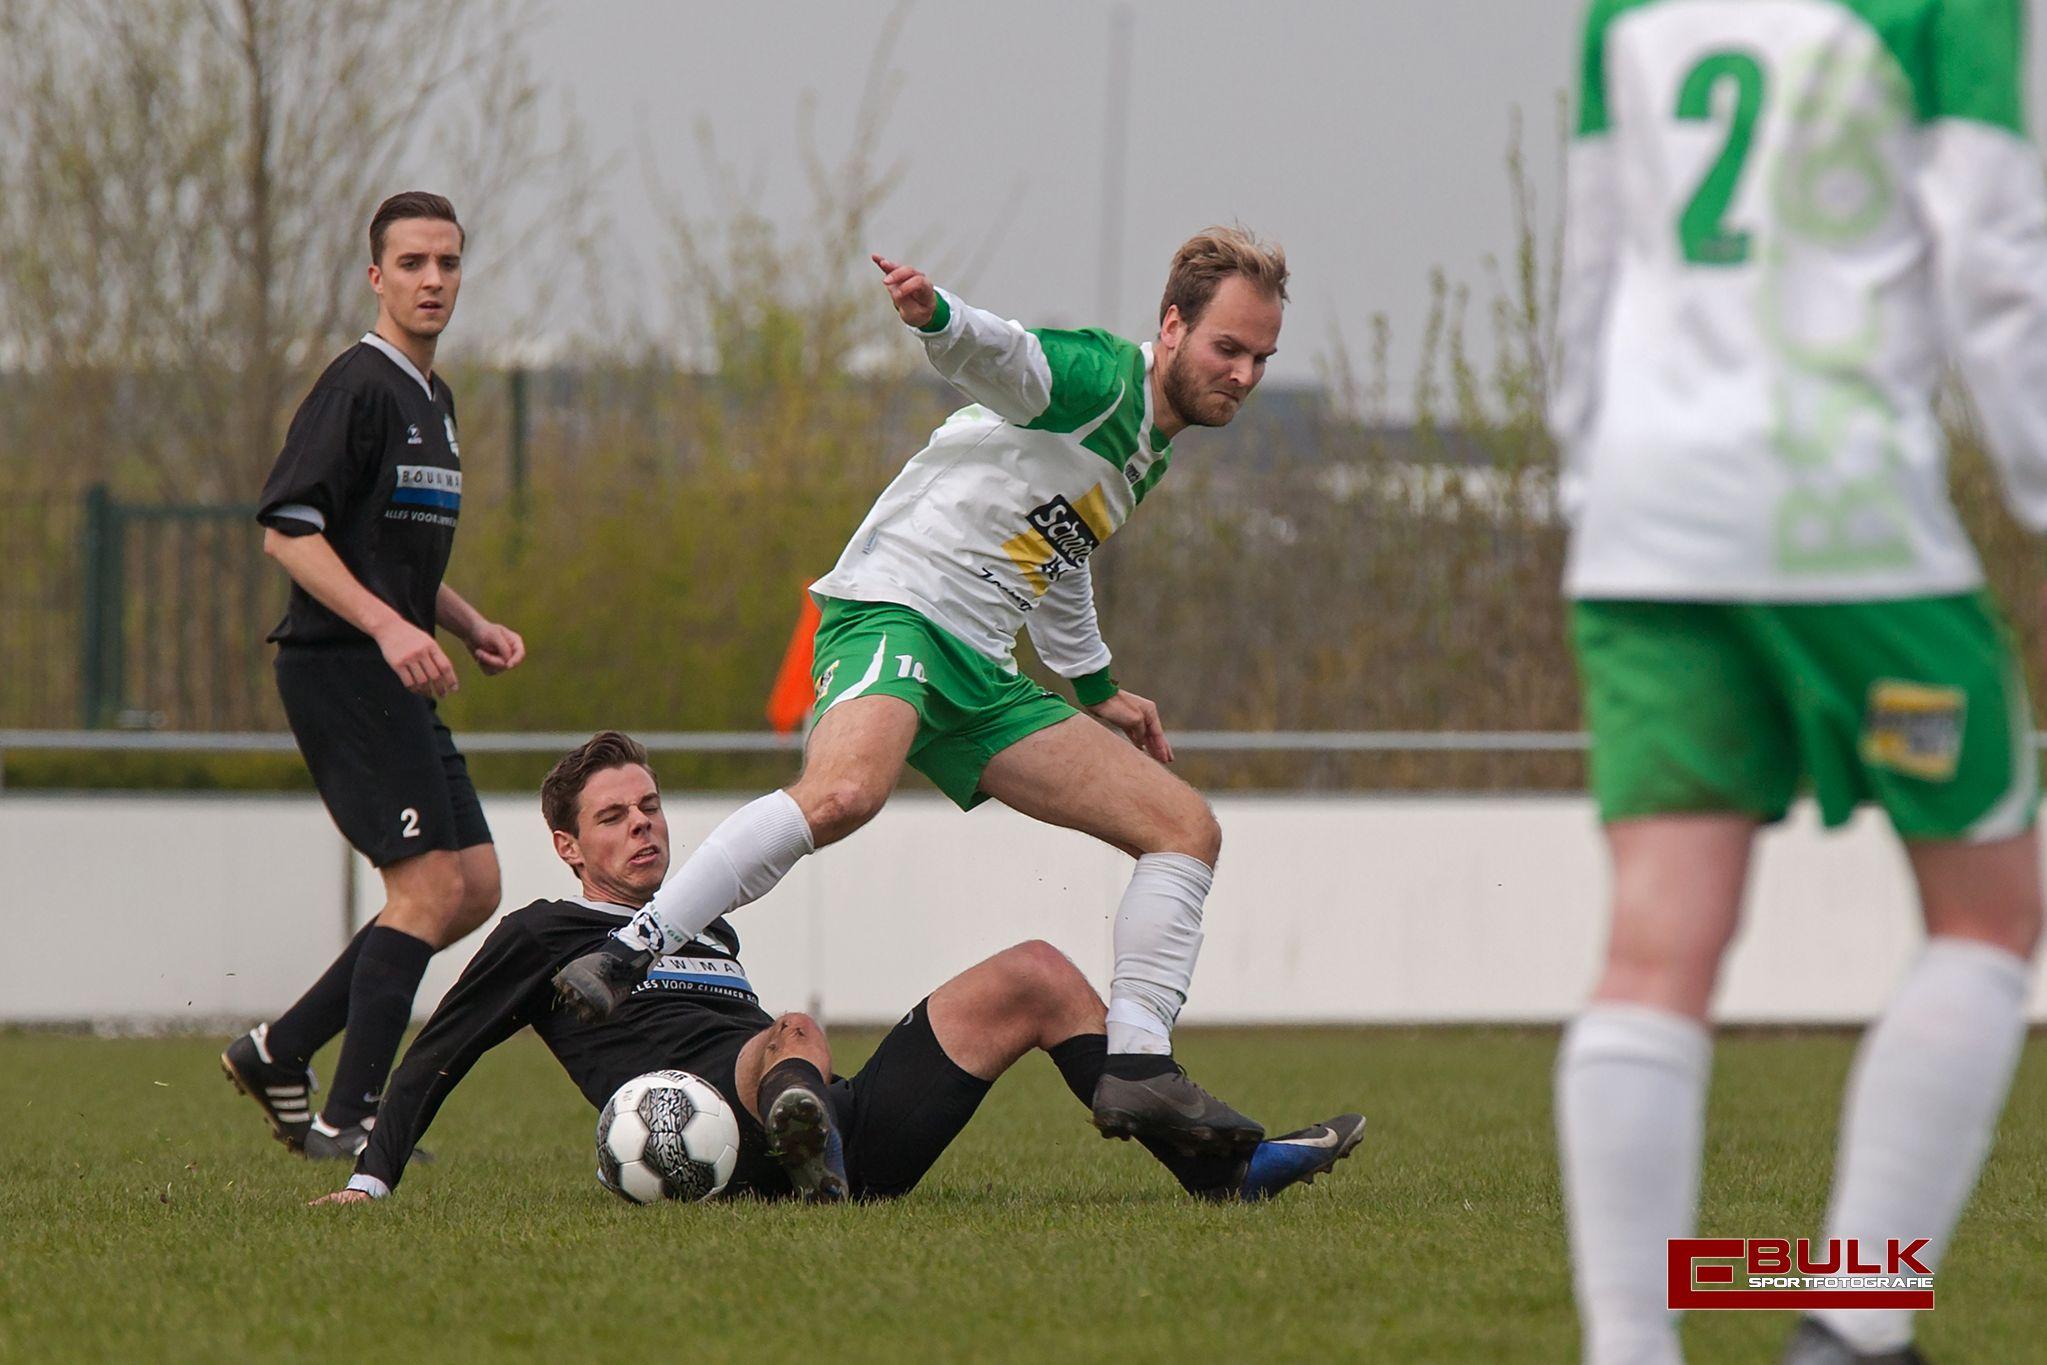 ebs_0162-ed_bulk_sportfotografie